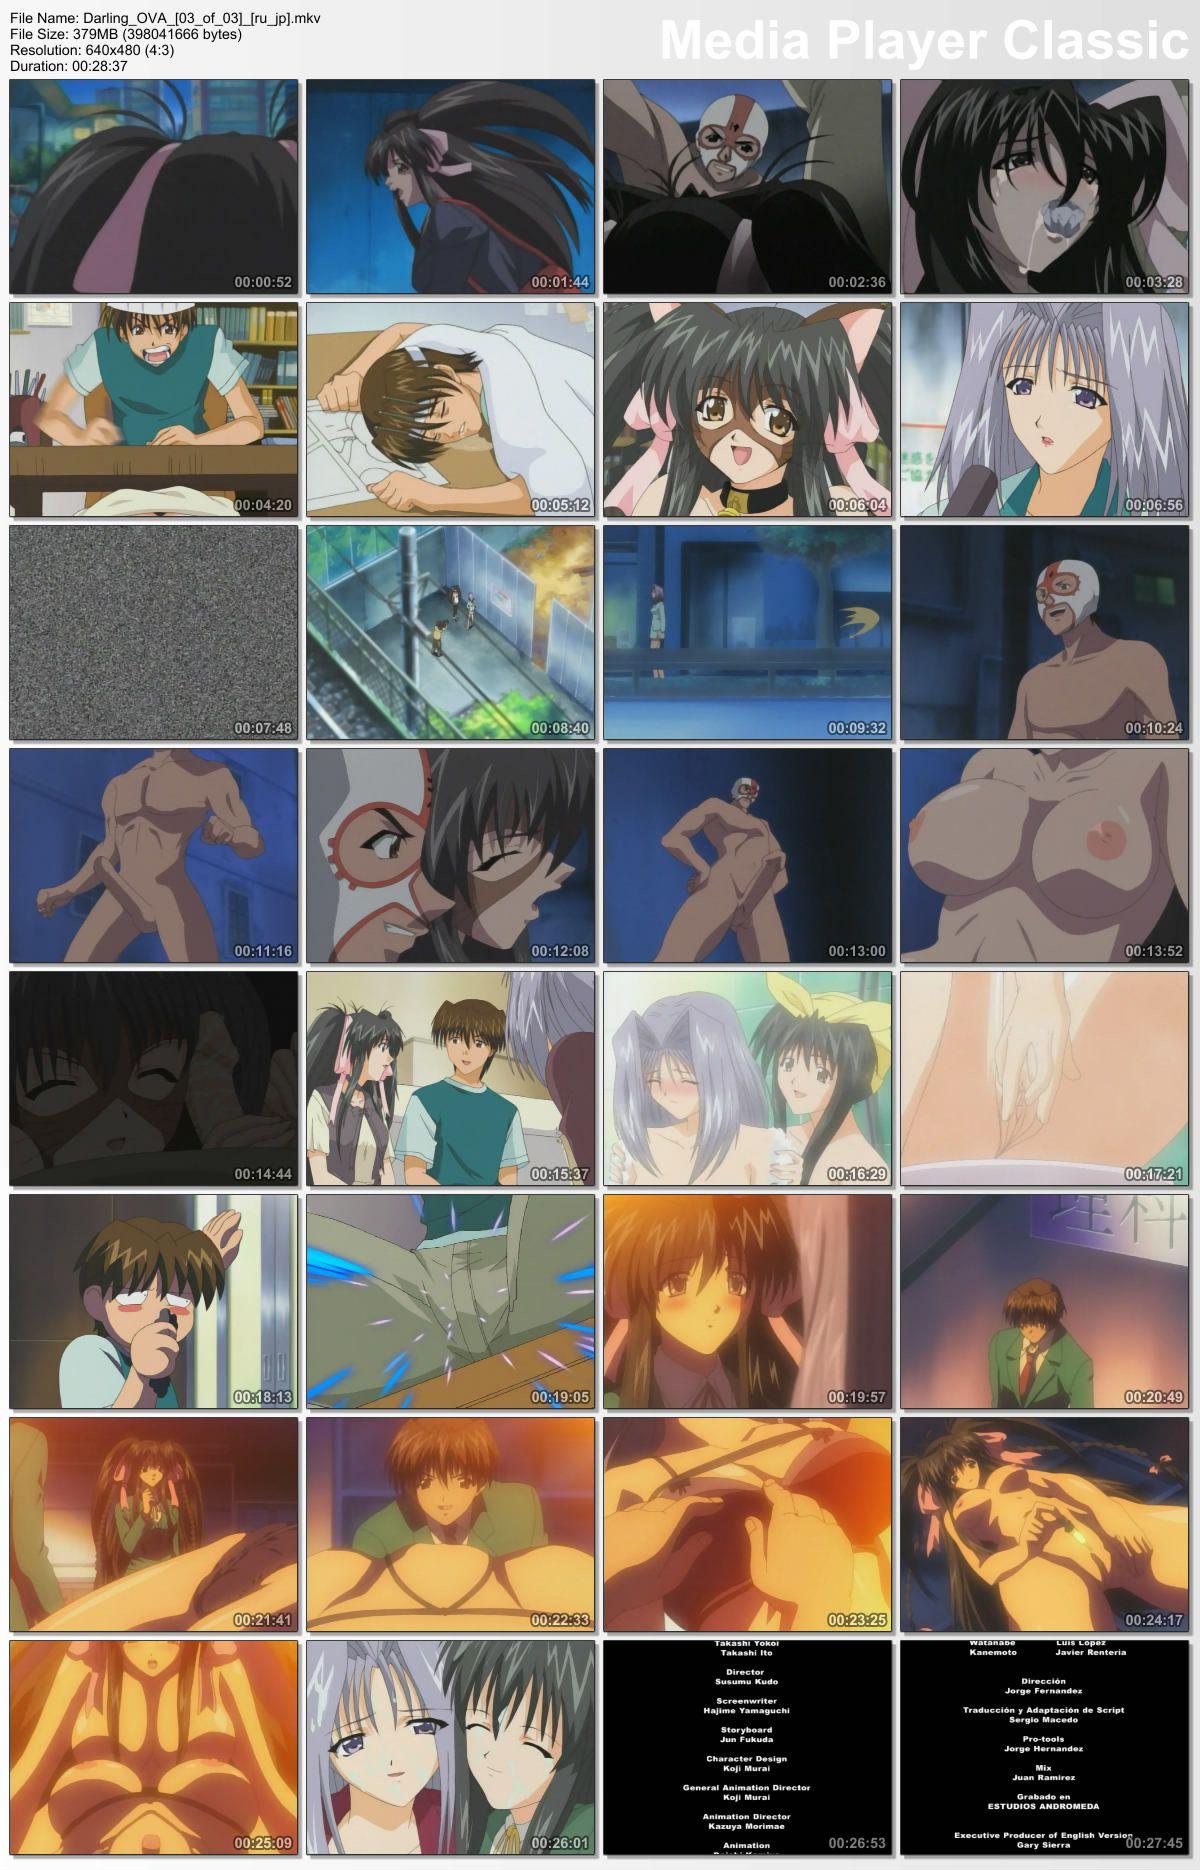 Darling / Darling Page / Дорогуша [3 из 3] [Rus,Eng,Spa,Jap] Anime Hentai